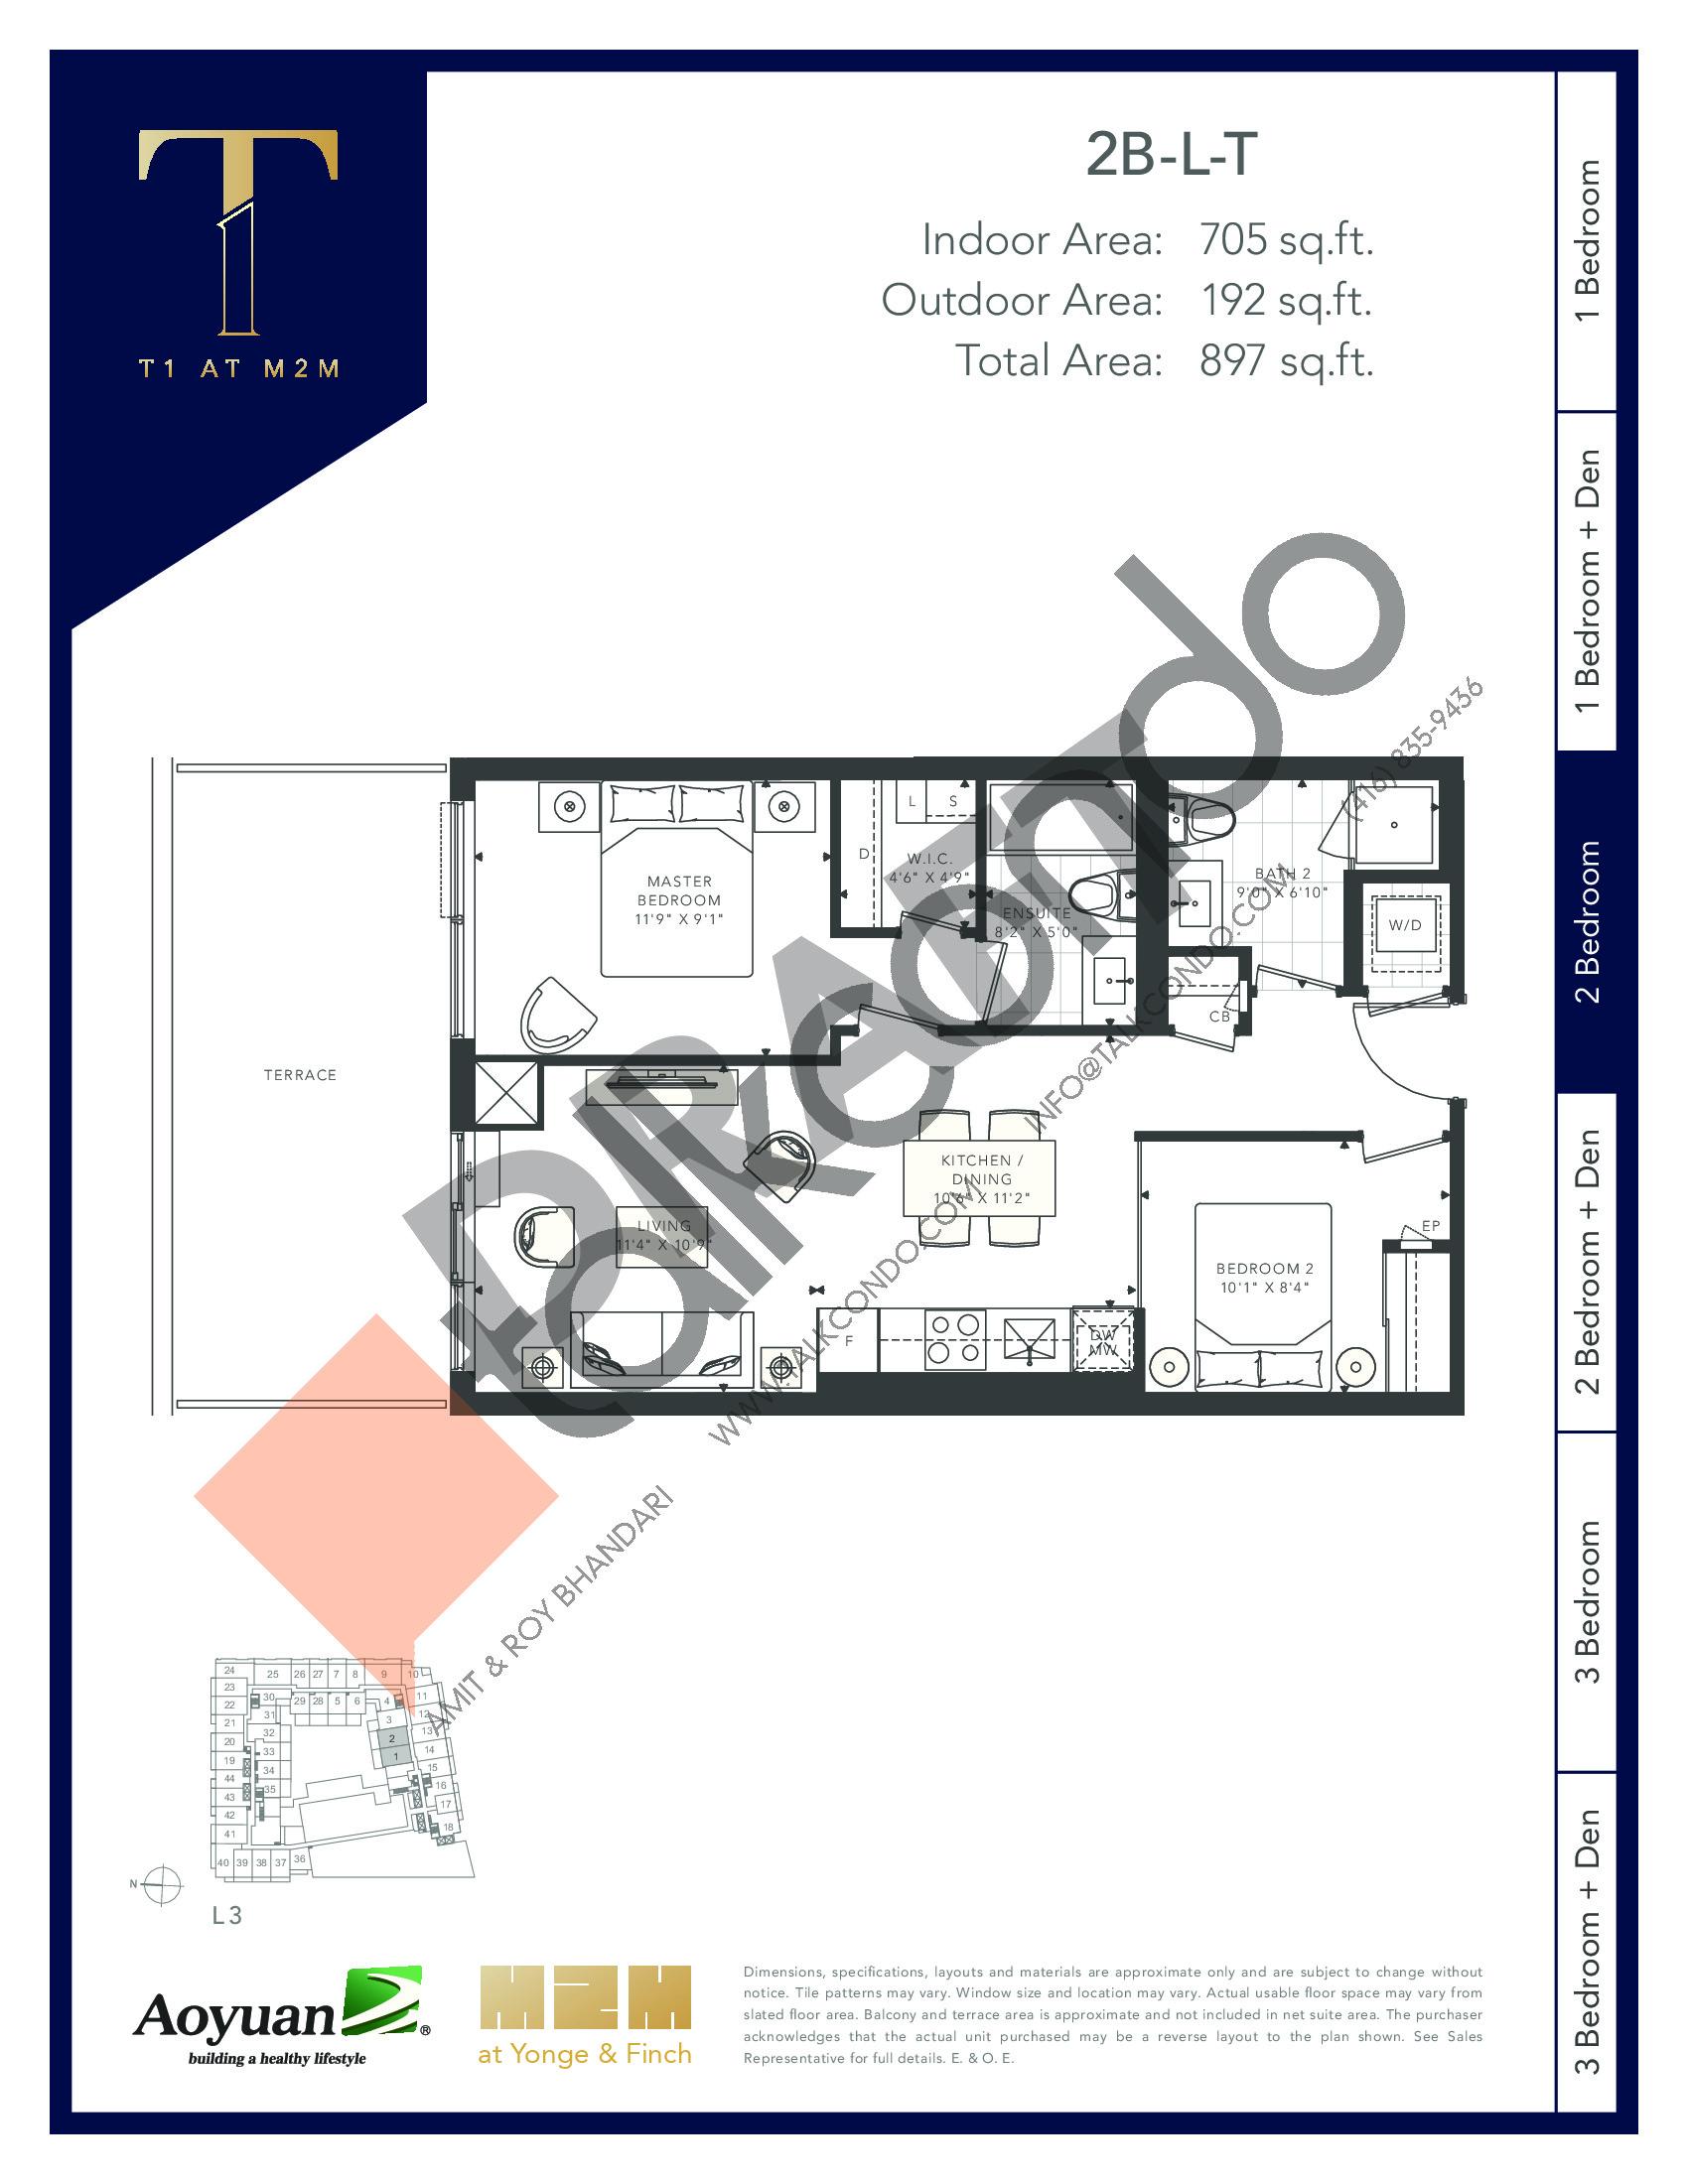 2B-L-T (Podium) Floor Plan at T1 at M2M Condos - 705 sq.ft